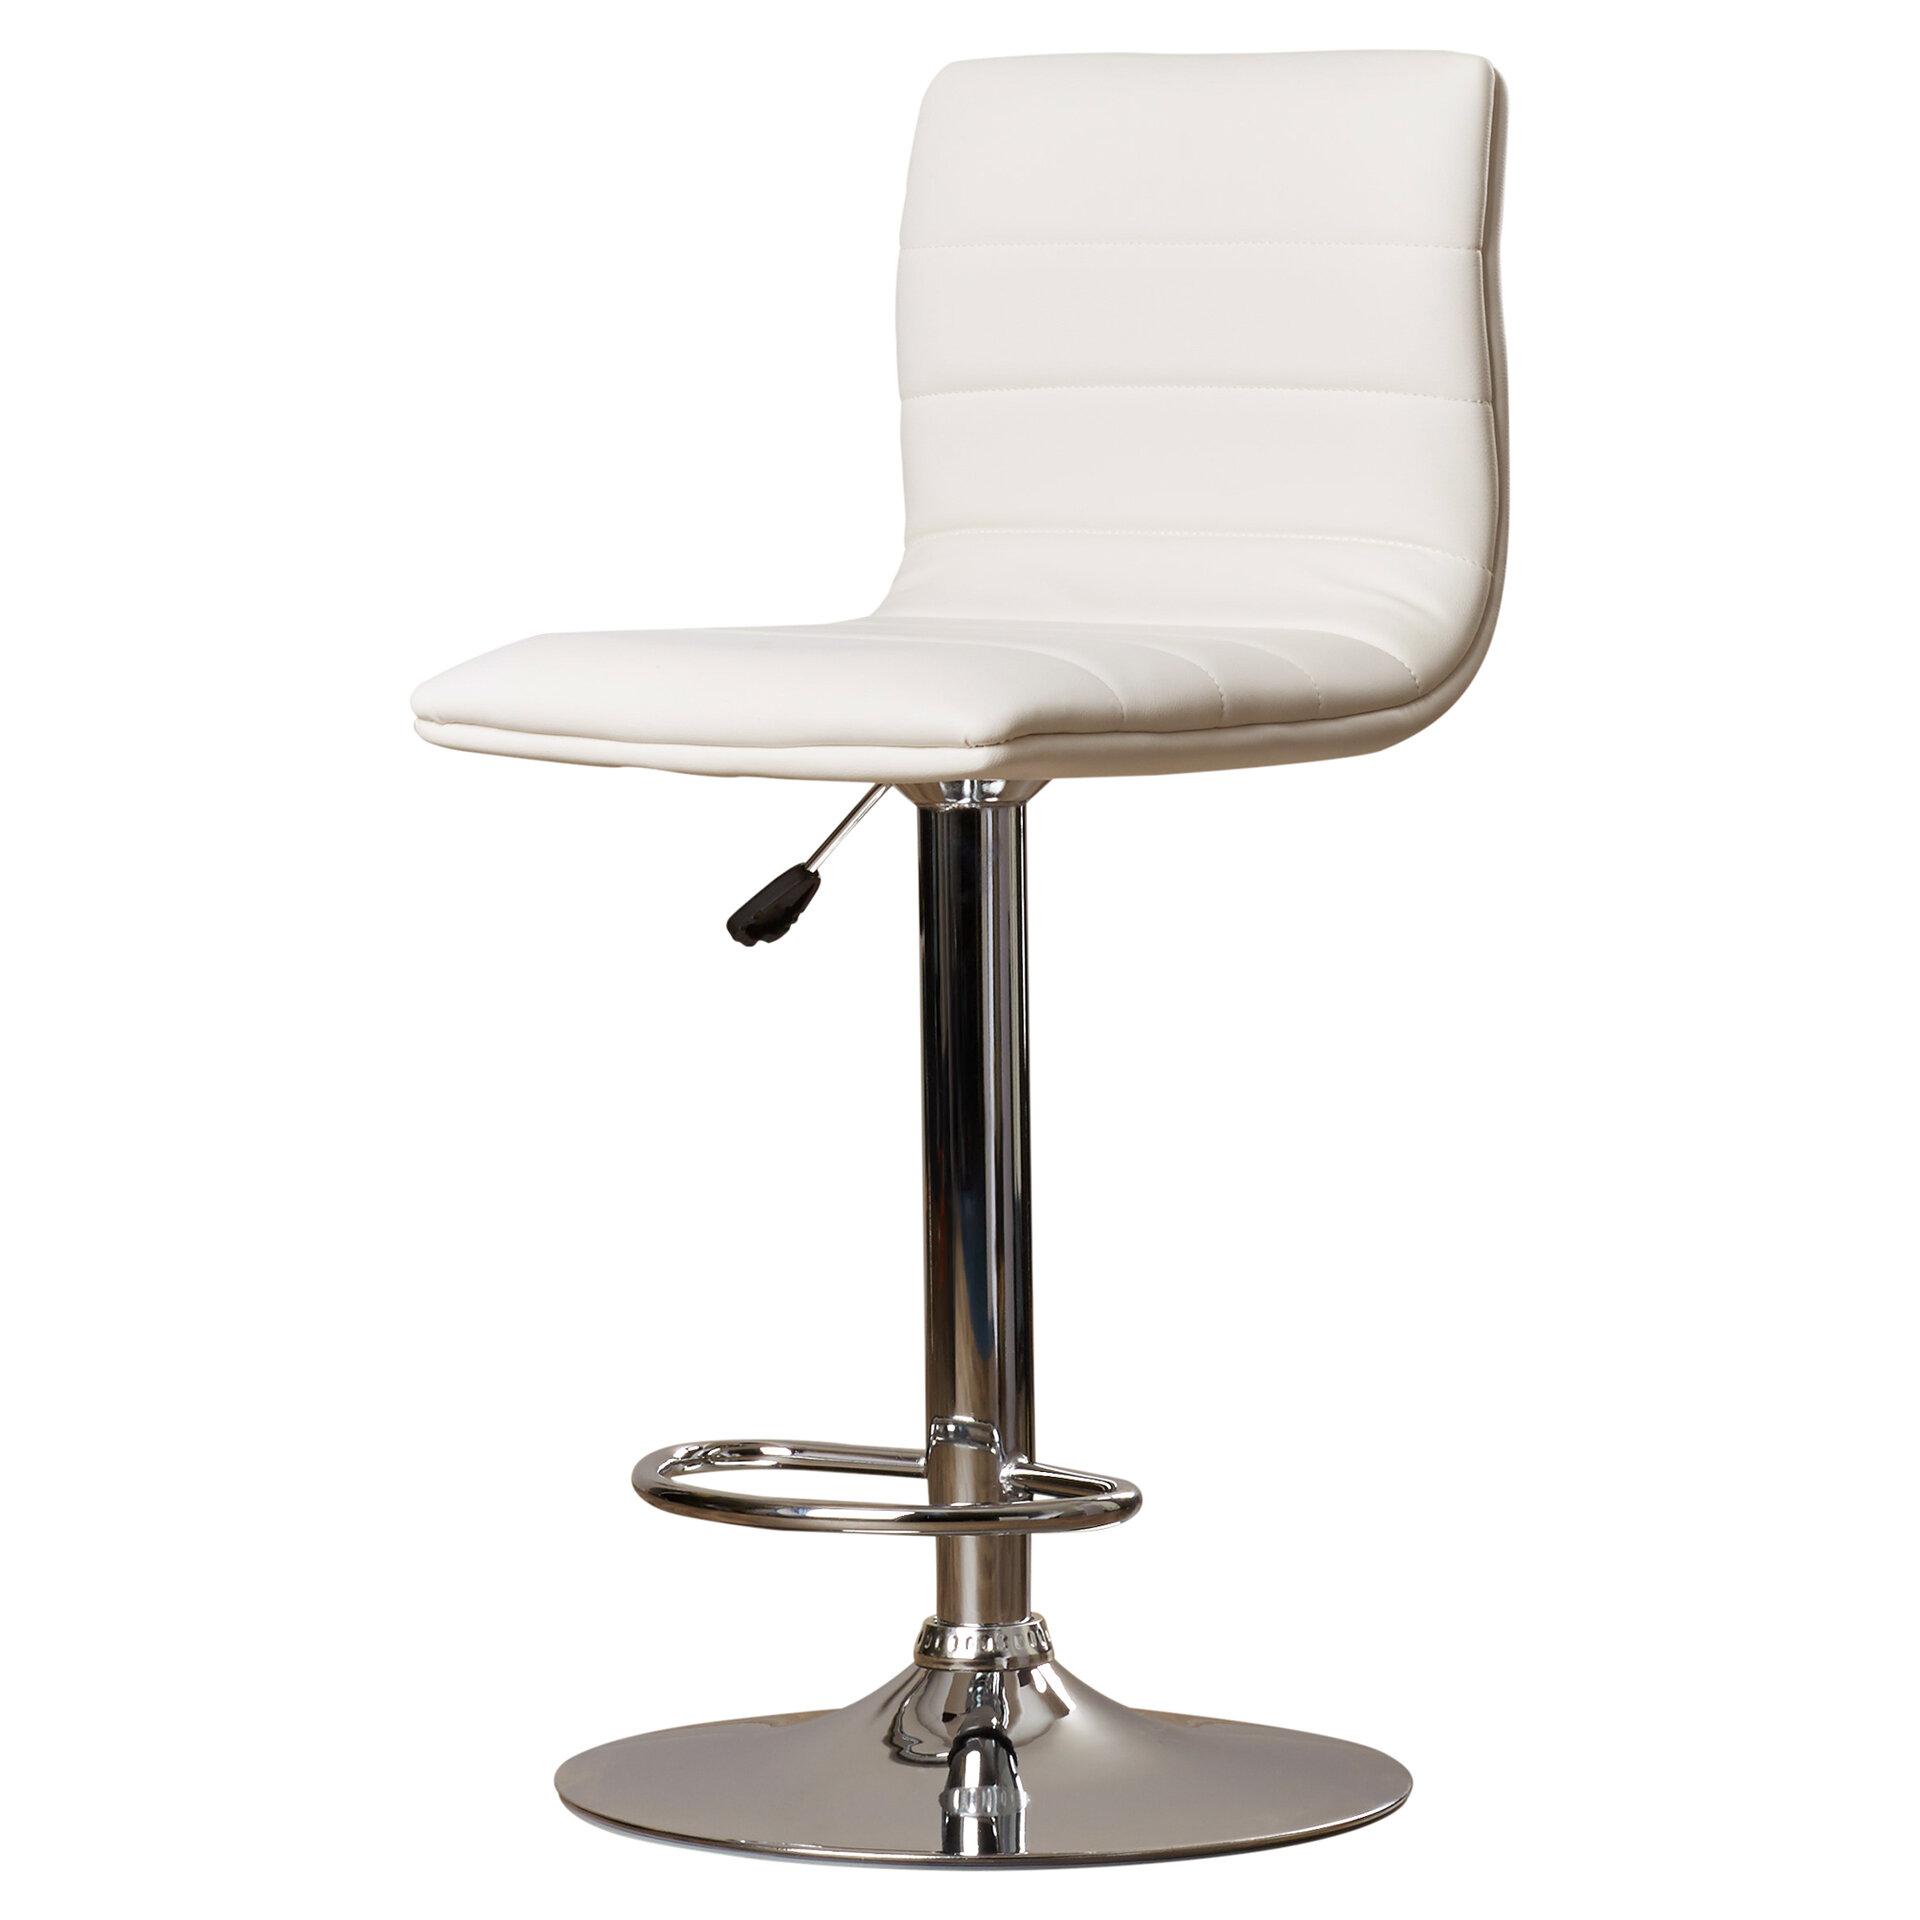 Admirable Alexandrea Adjustable Height Swivel Bar Stool Beatyapartments Chair Design Images Beatyapartmentscom